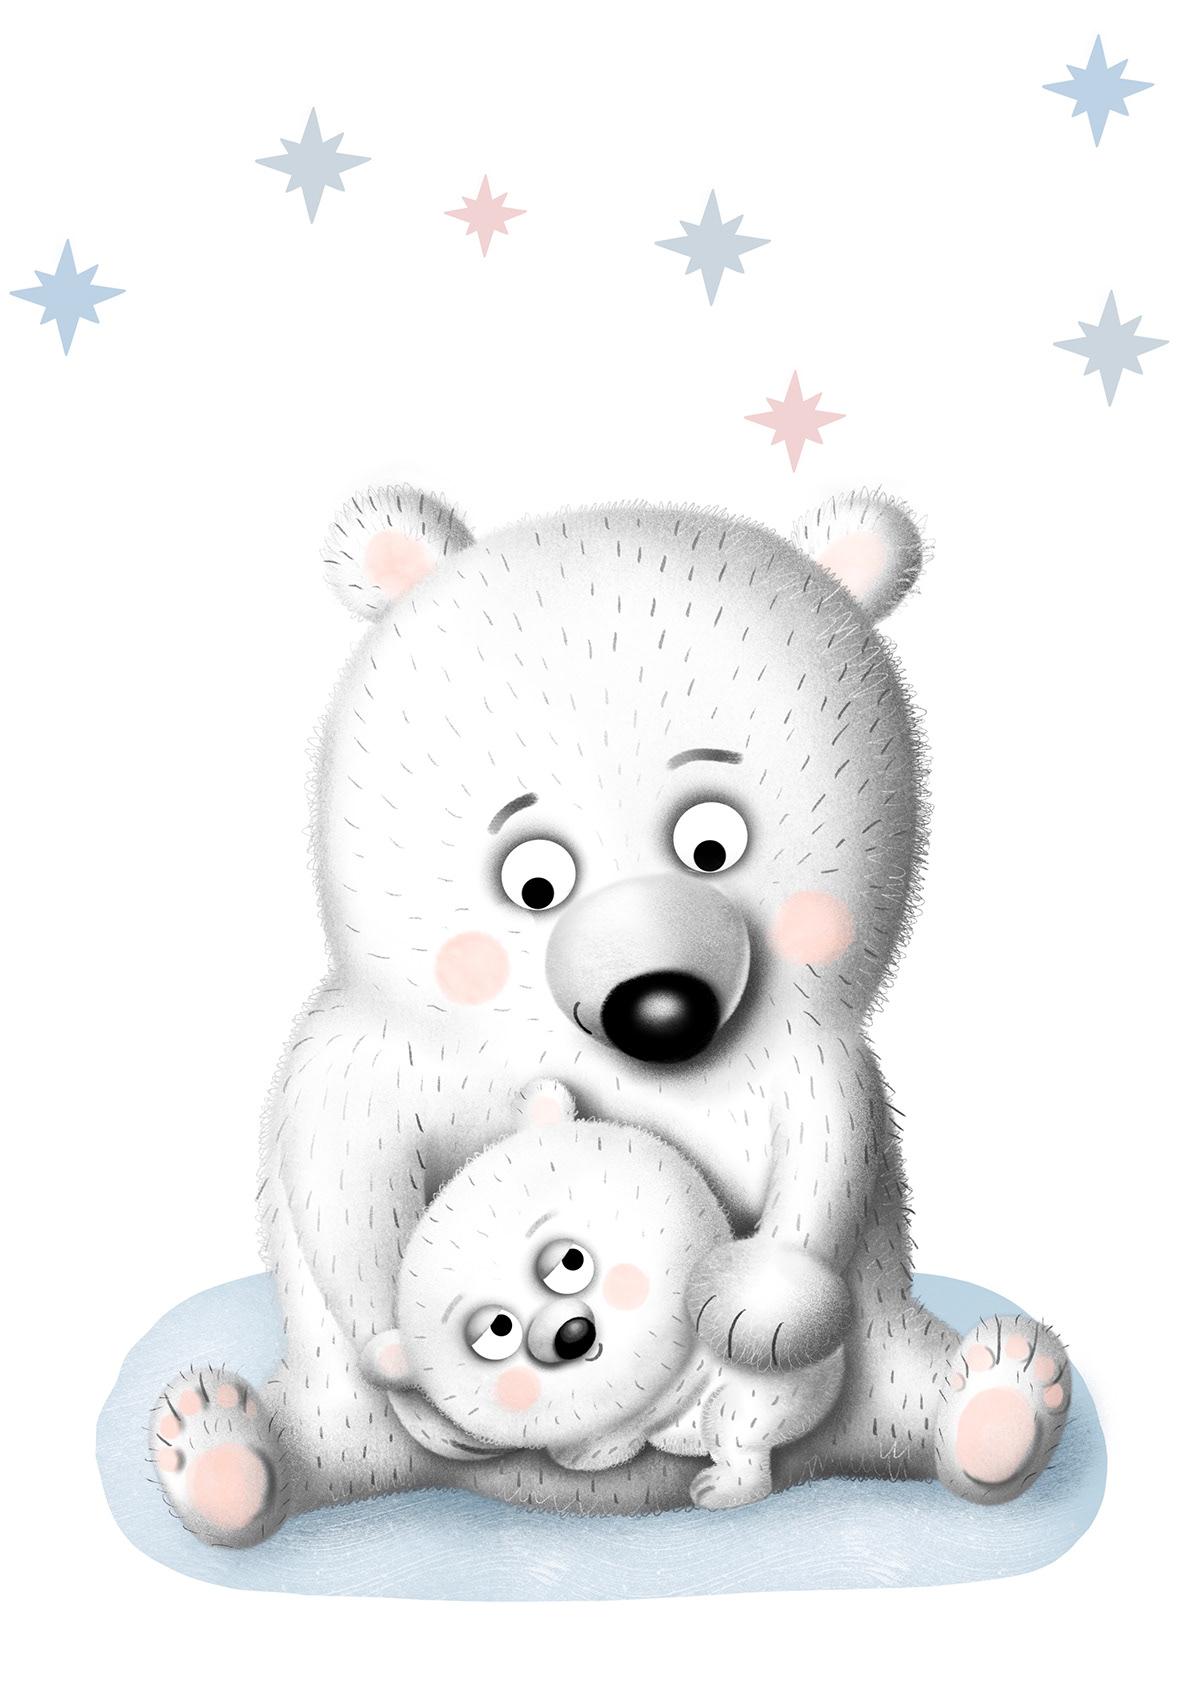 ILLUSTRATION  Love mother Polar Bear snow winter